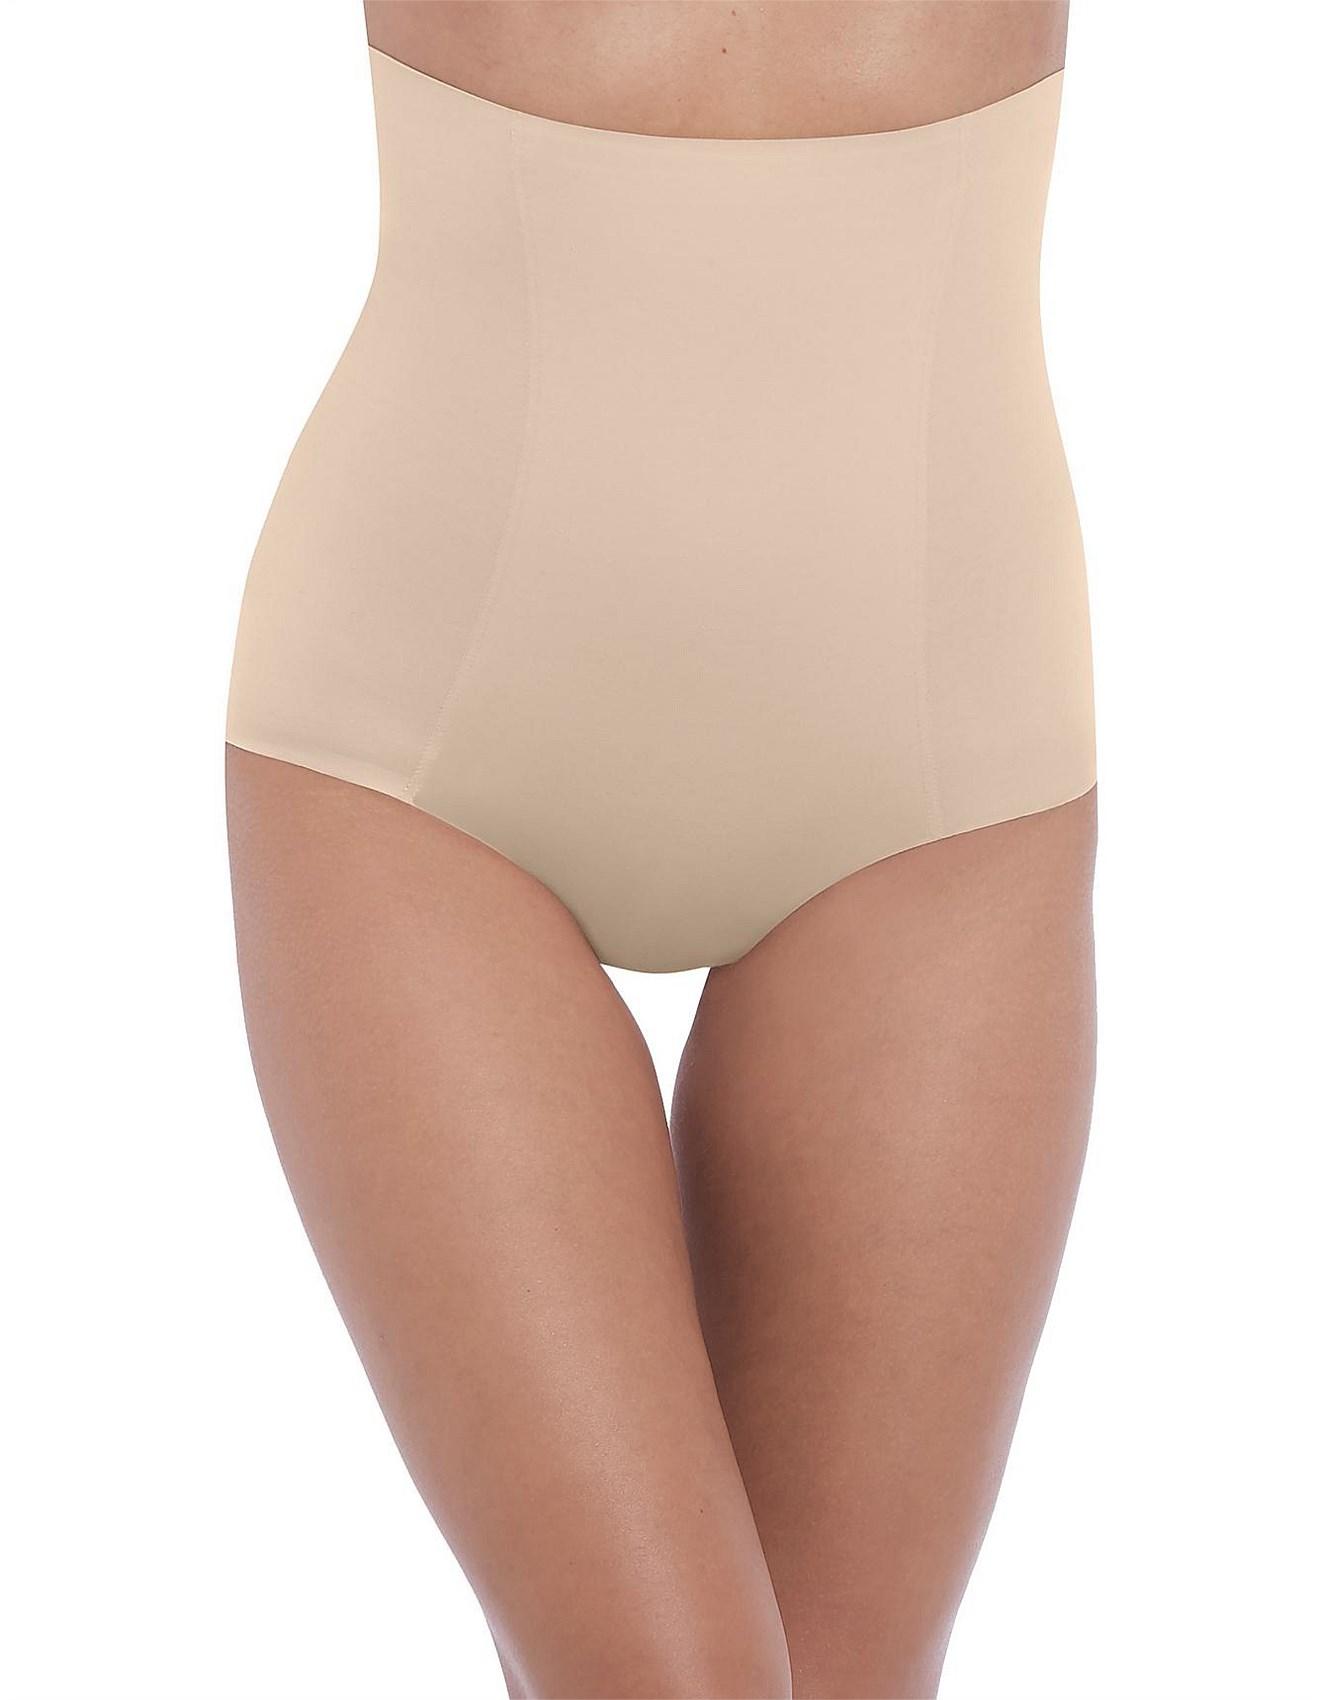 89fd1f88c85a Lingerie Sale | Women's Underwear Sale Online | David Jones - Beyond Naked  Cotton Shapewear High Waist Brief